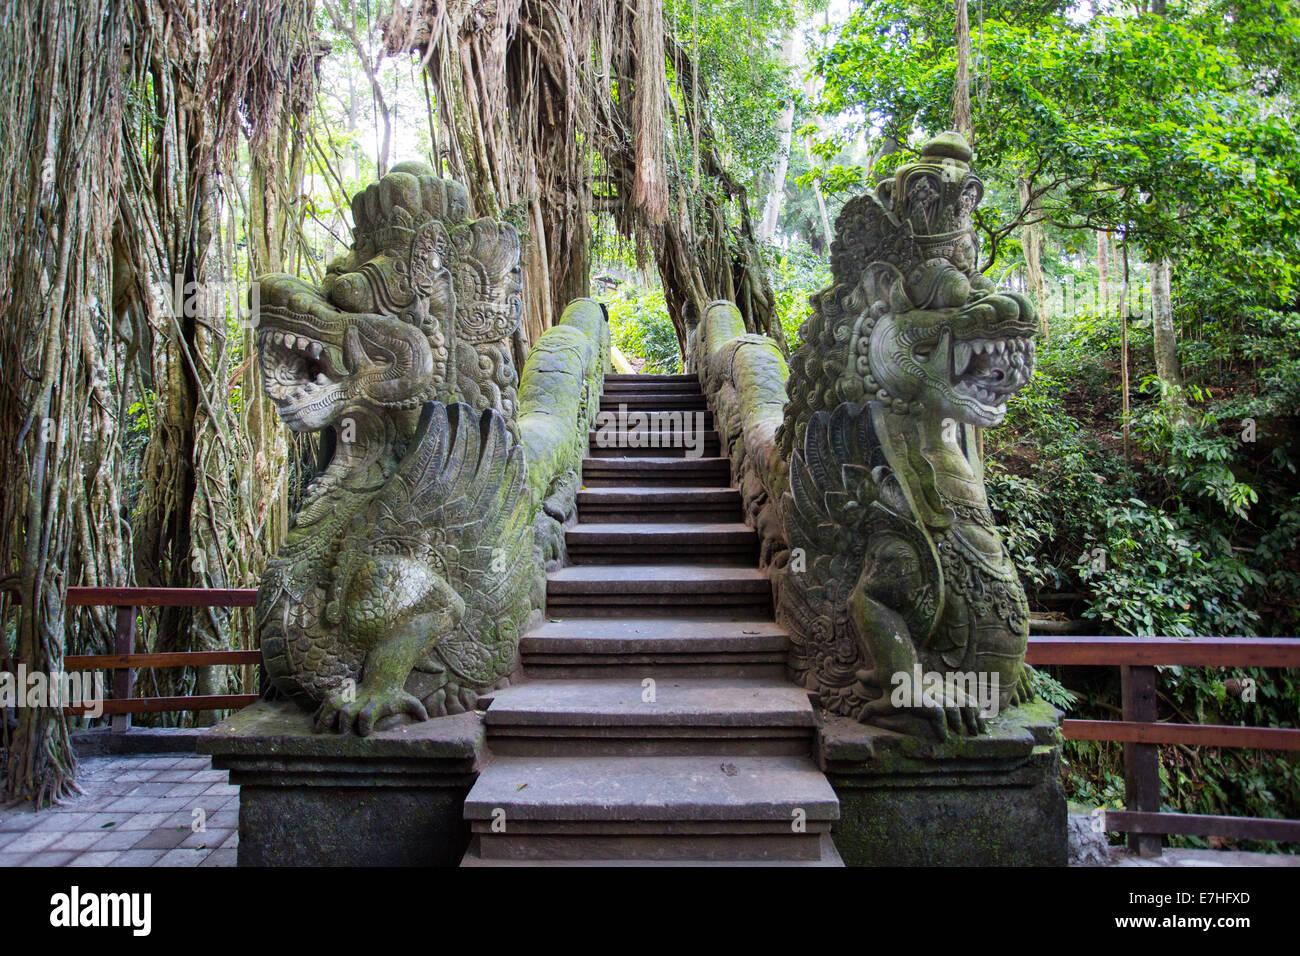 Dragon Bridge in Monkey Forest Sanctuary in Ubud, Bali,Indonesia - Stock Image